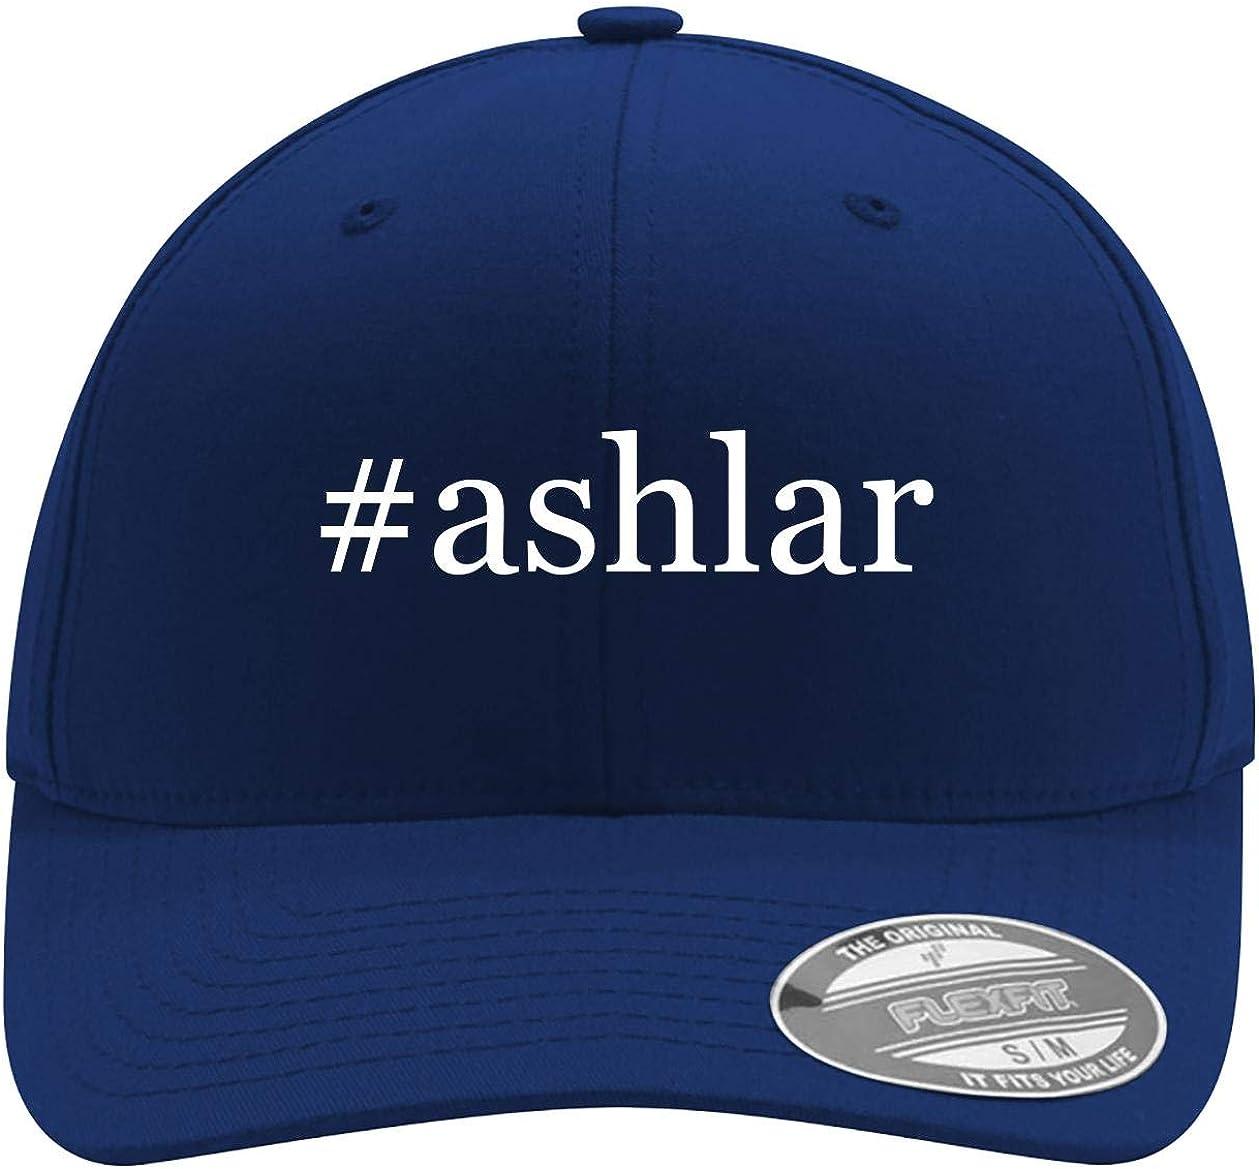 #Ashlar - Men'S Hashtag Flexfit Baseball Hut Cap